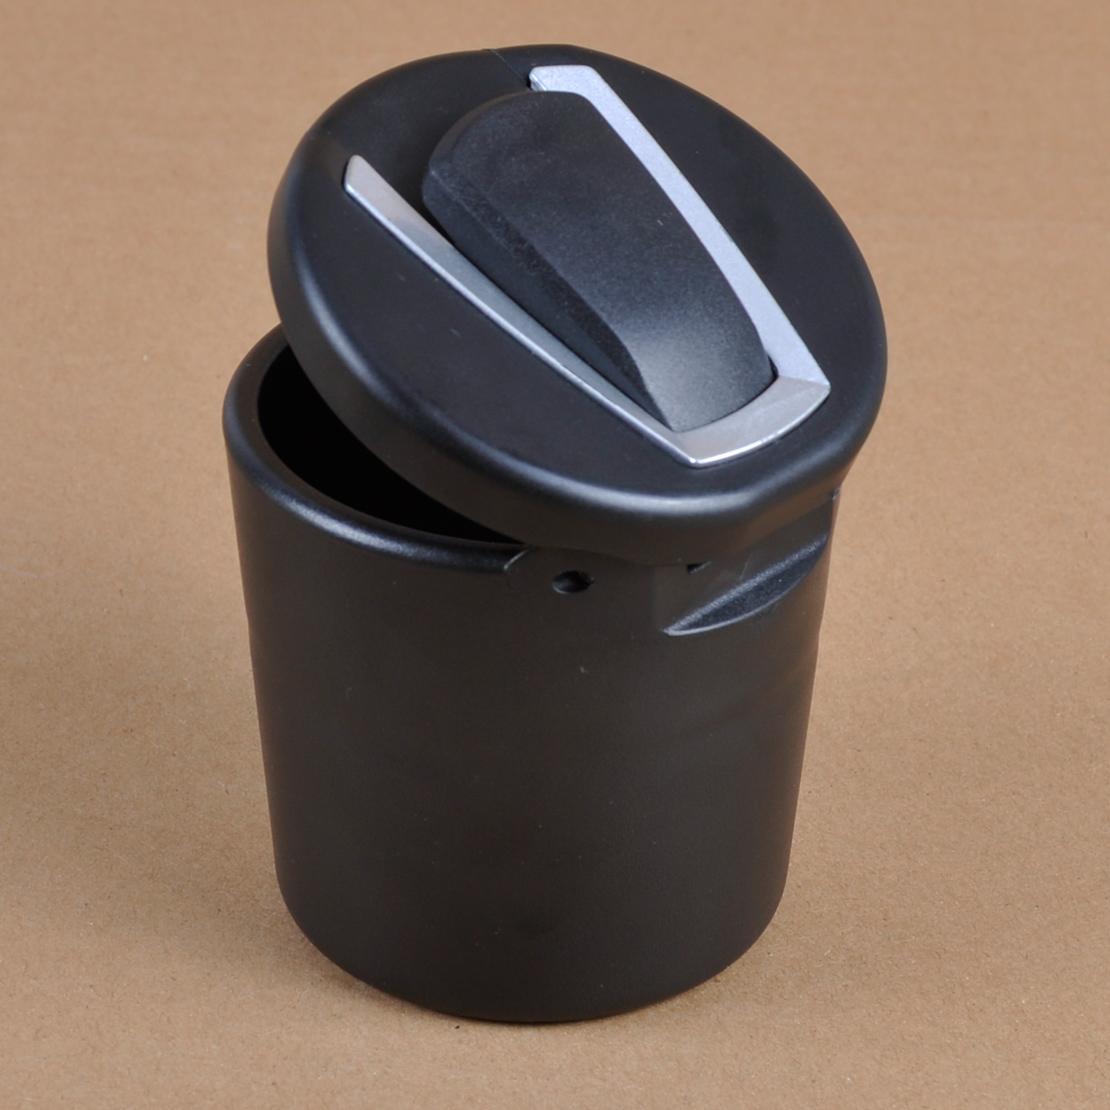 car interior led ashtray trash cans for bmw 1 3 5 7series e70 e71 e90 e92 e93 x1 ebay. Black Bedroom Furniture Sets. Home Design Ideas